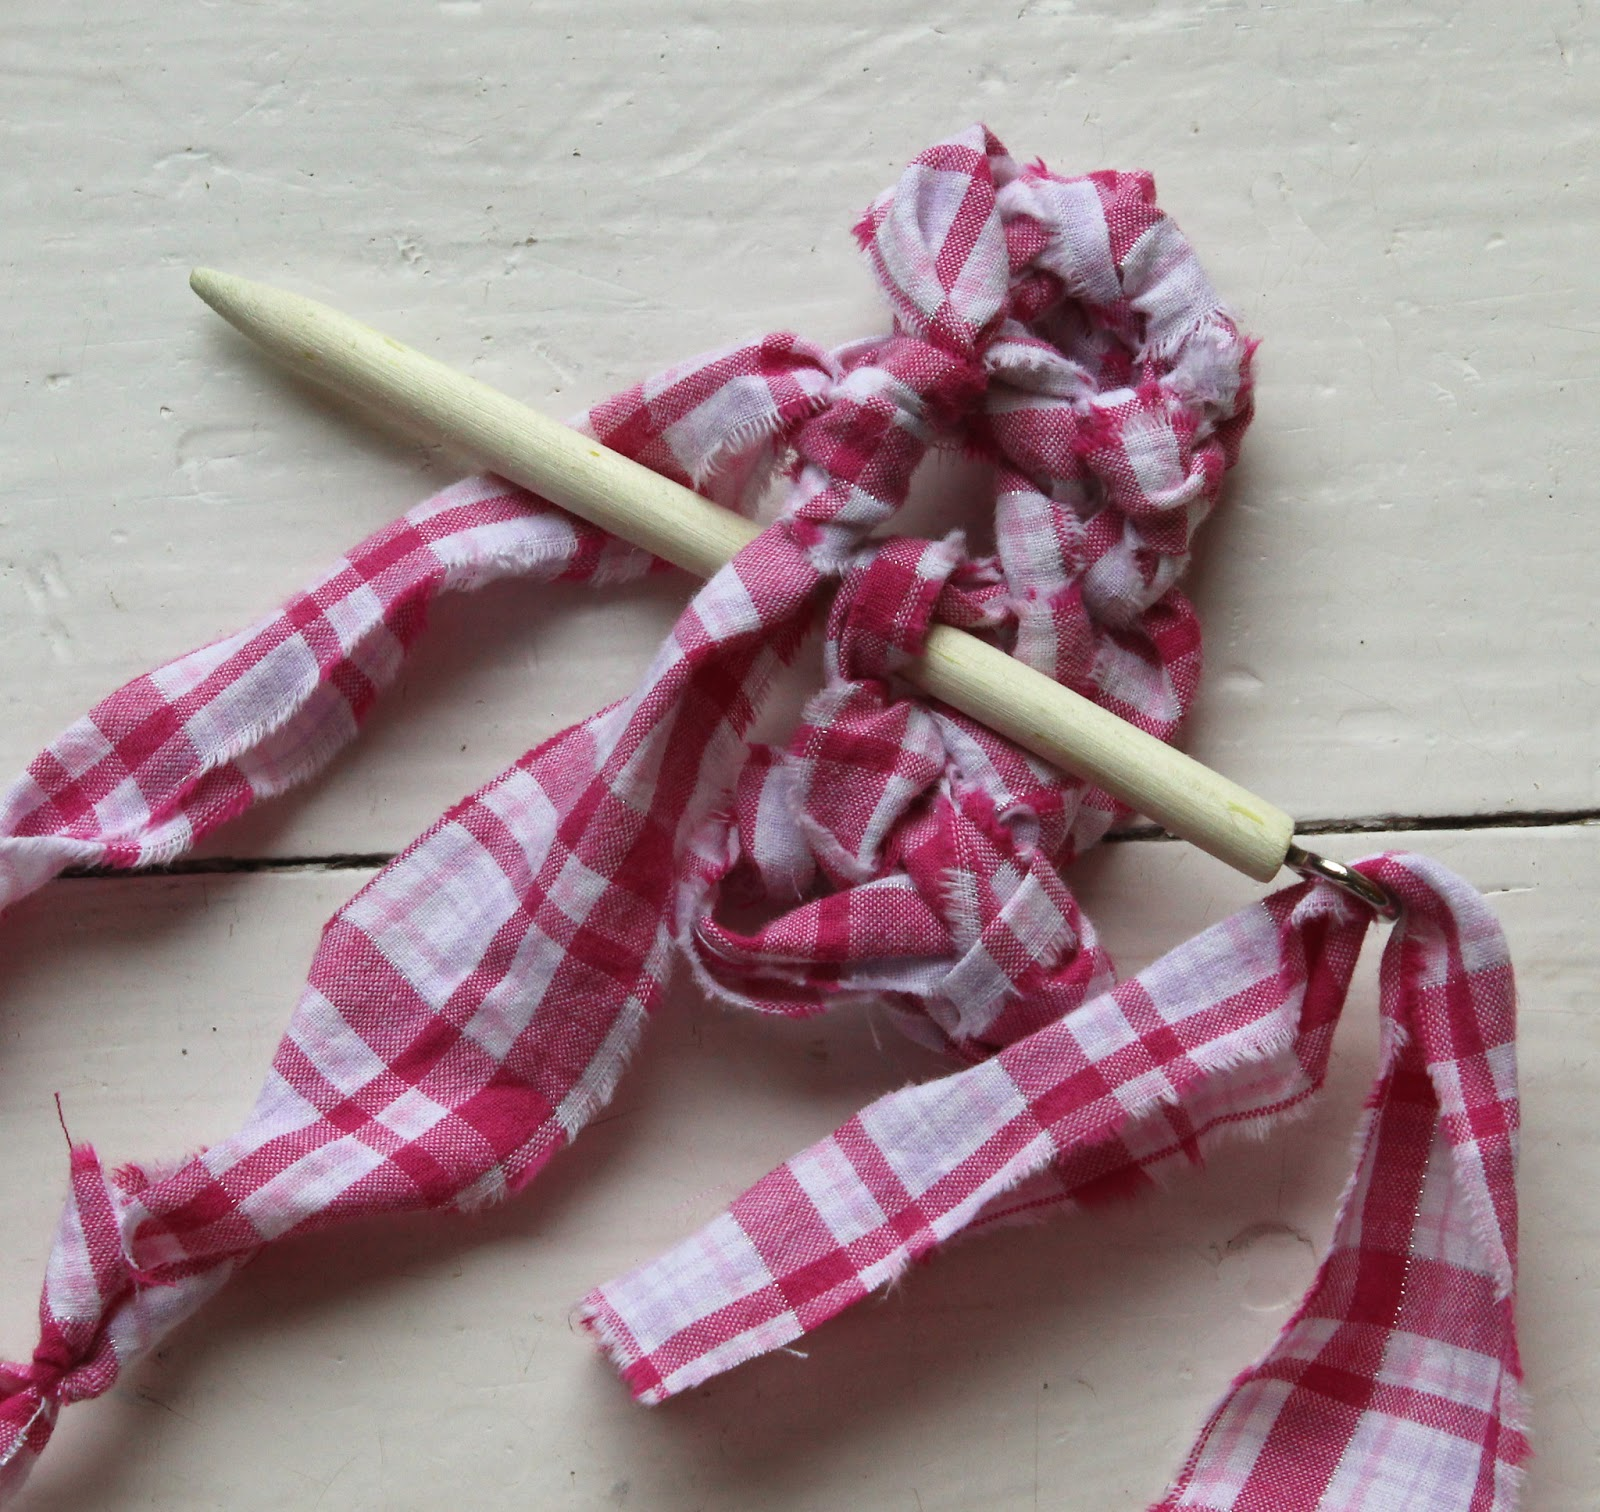 Little Bird SOS: Rag Rugs: Amish Knot Rugs